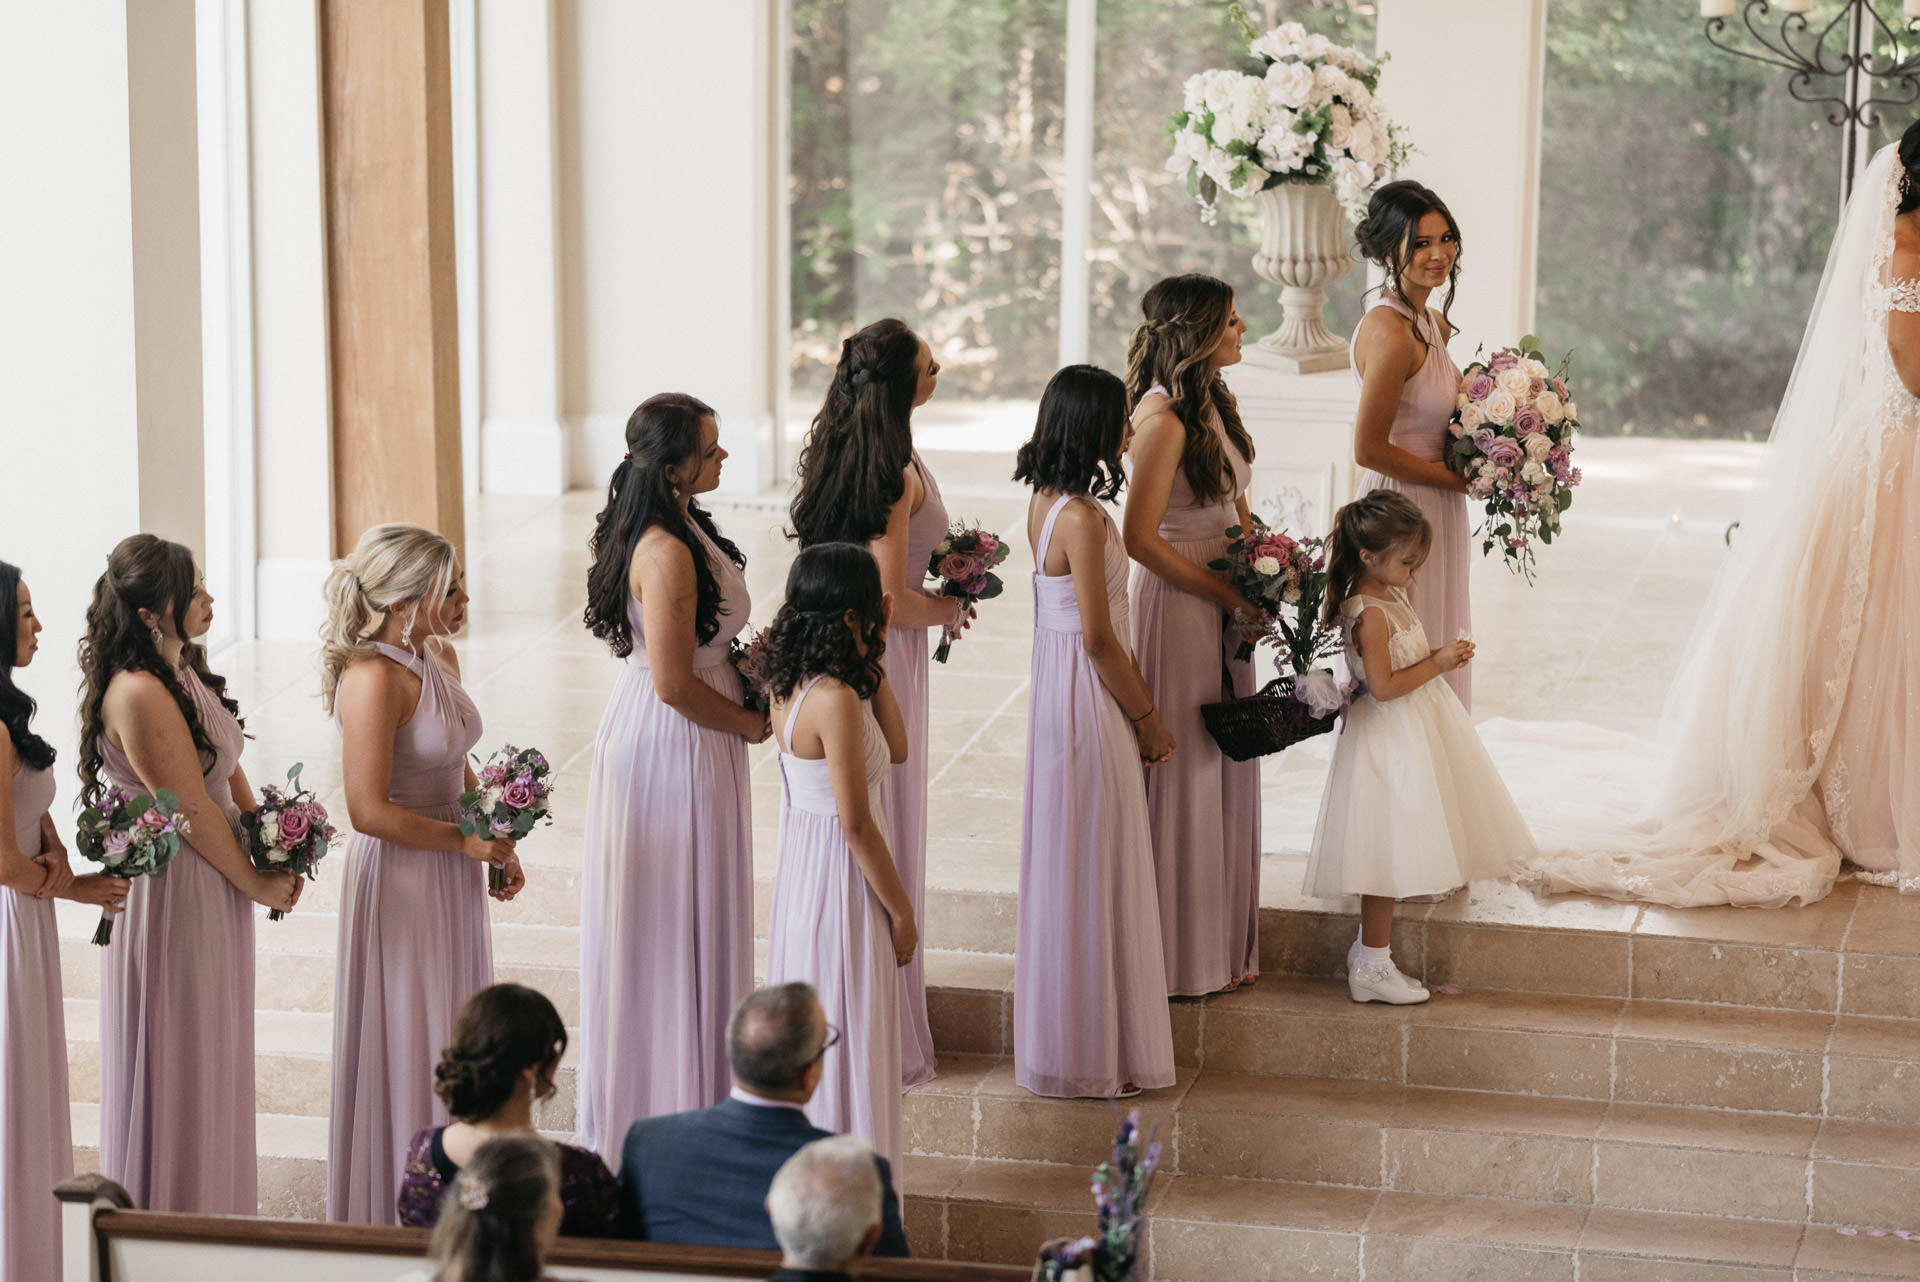 lexi-michael-wedding-blog-sm-57.jpg